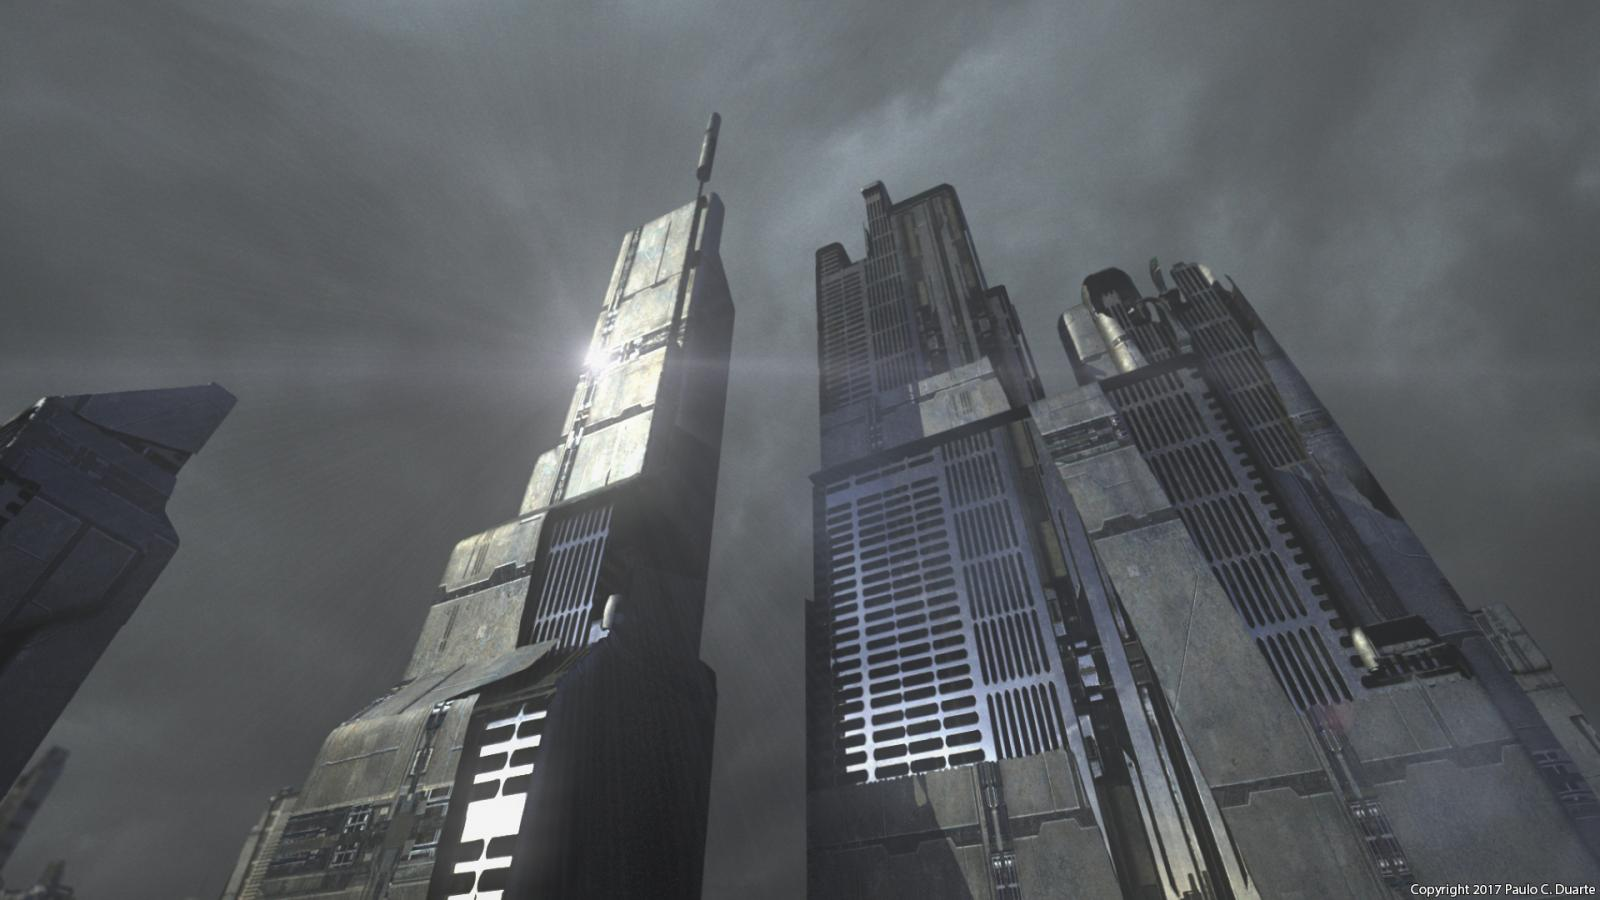 sci-fi_city_concept_002.jpg